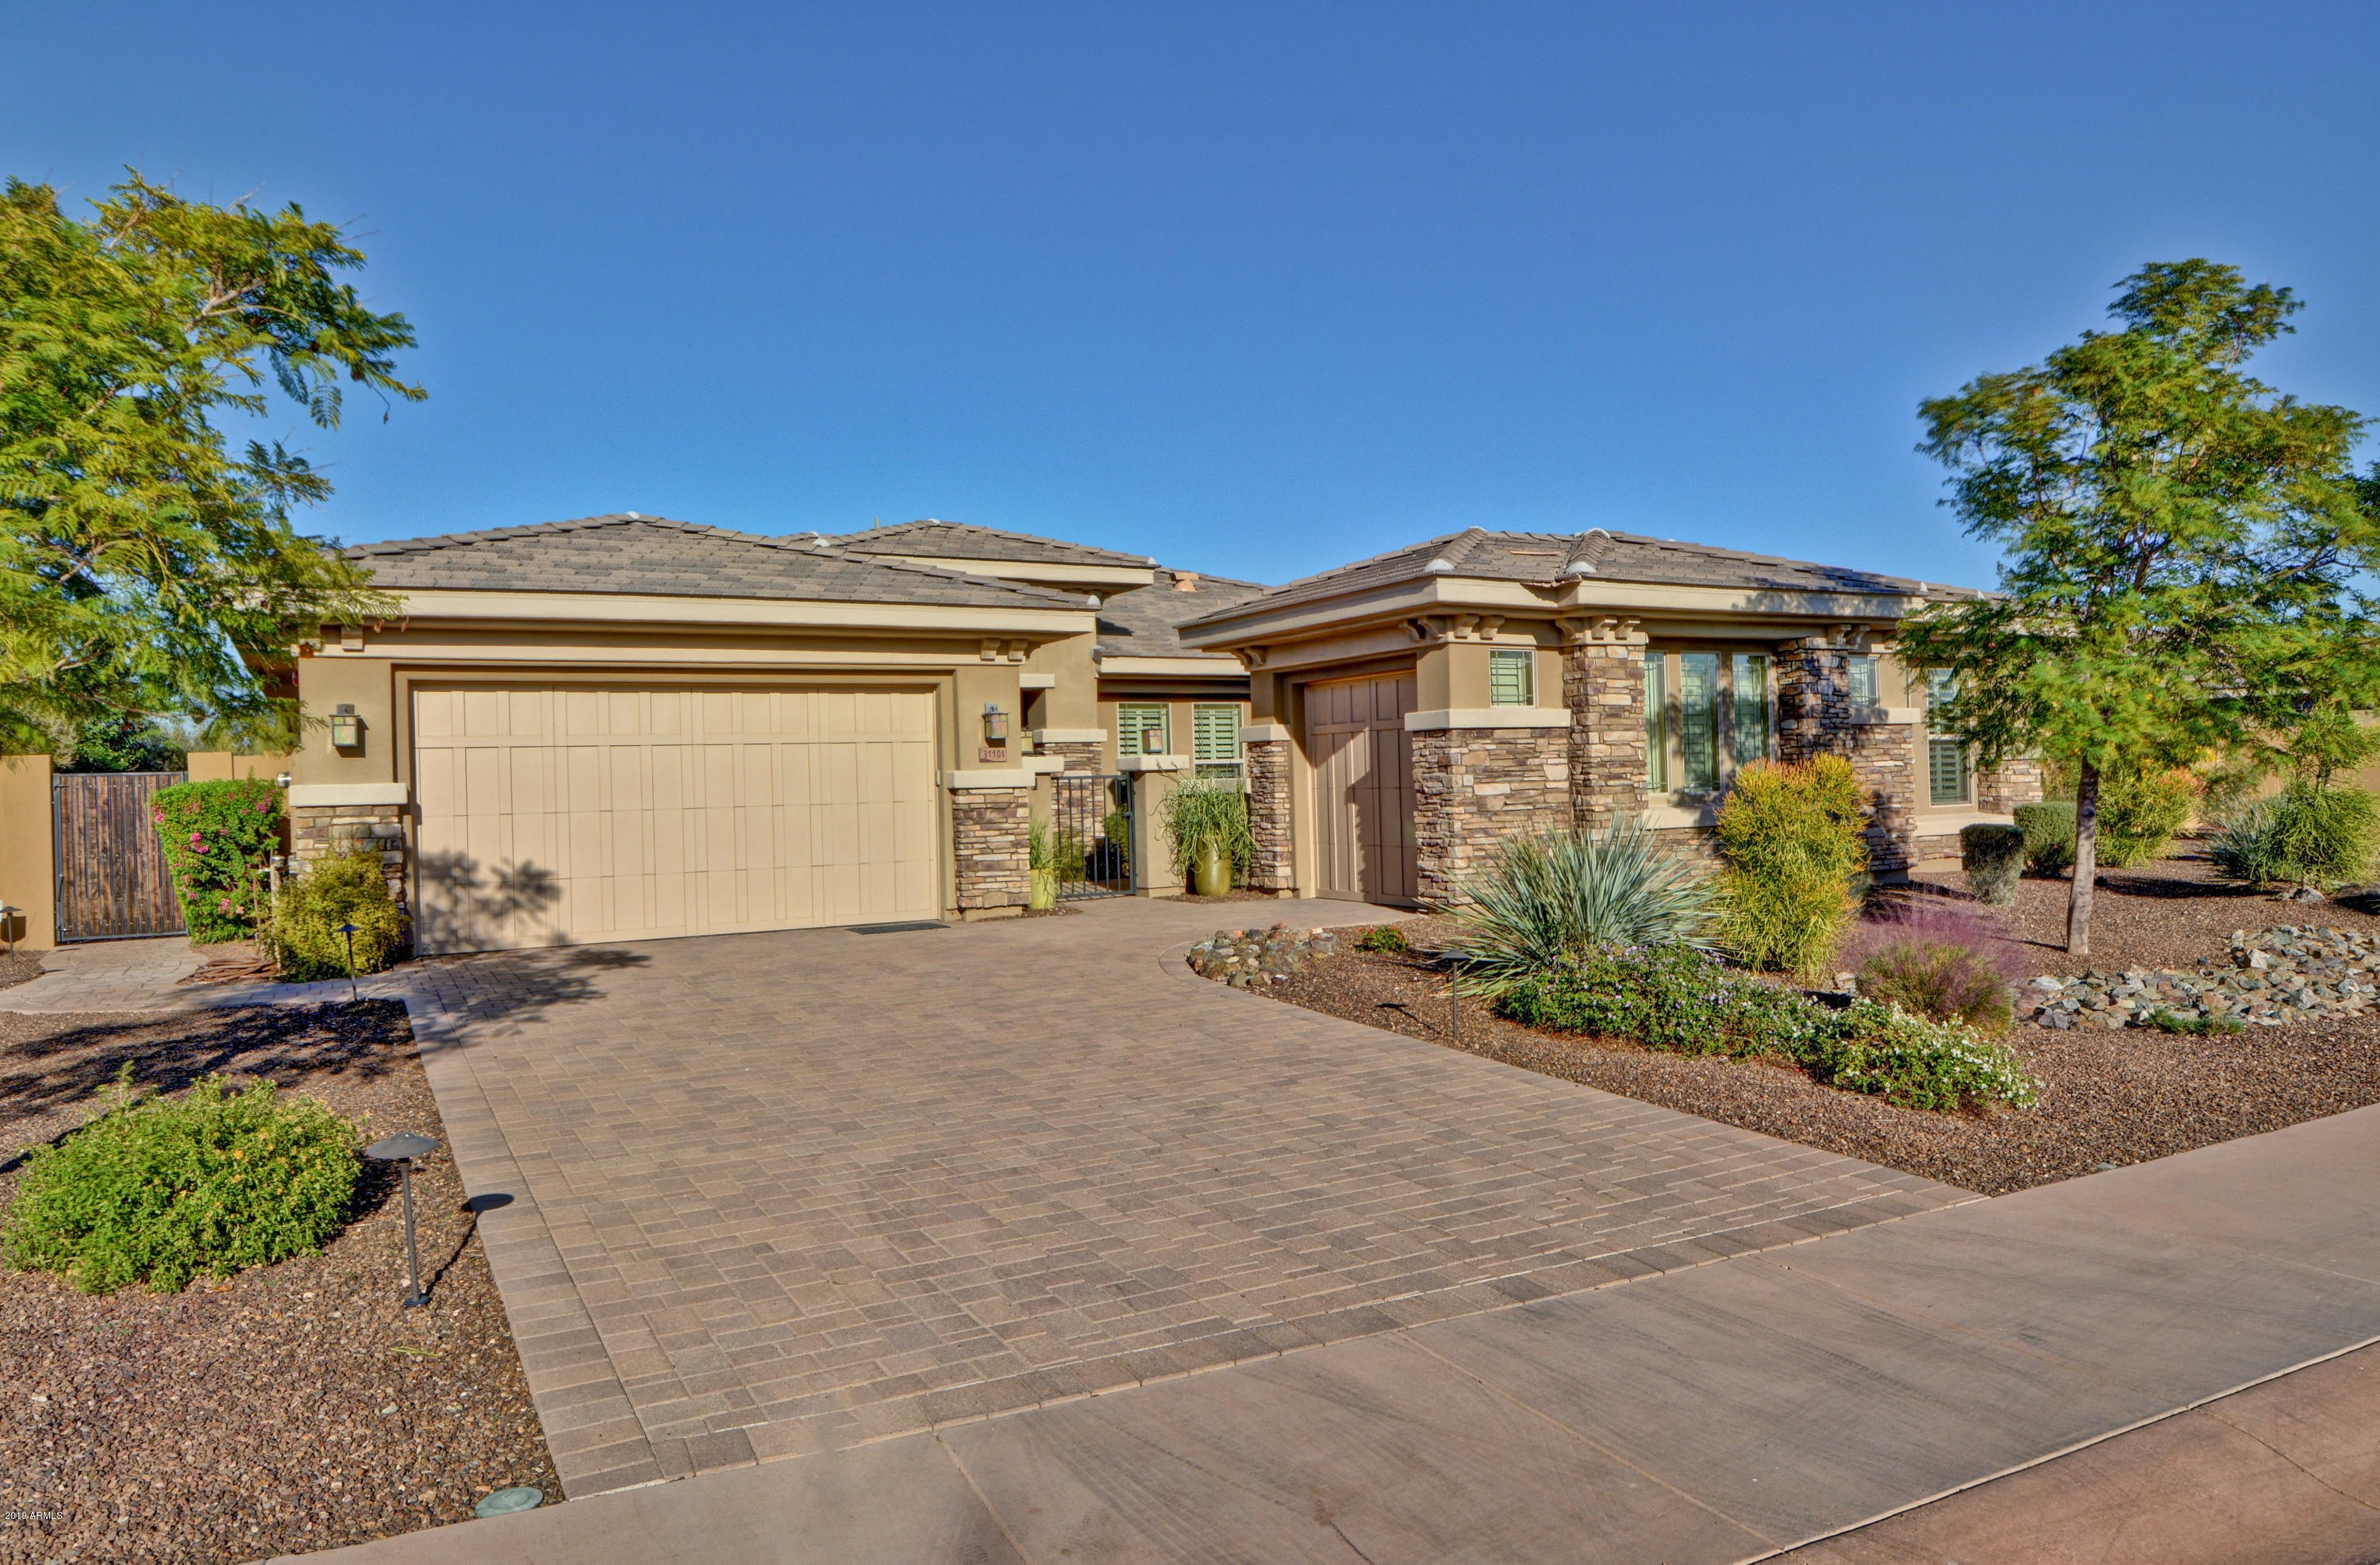 Photo of 31101 N 129TH Avenue, Peoria, AZ 85383